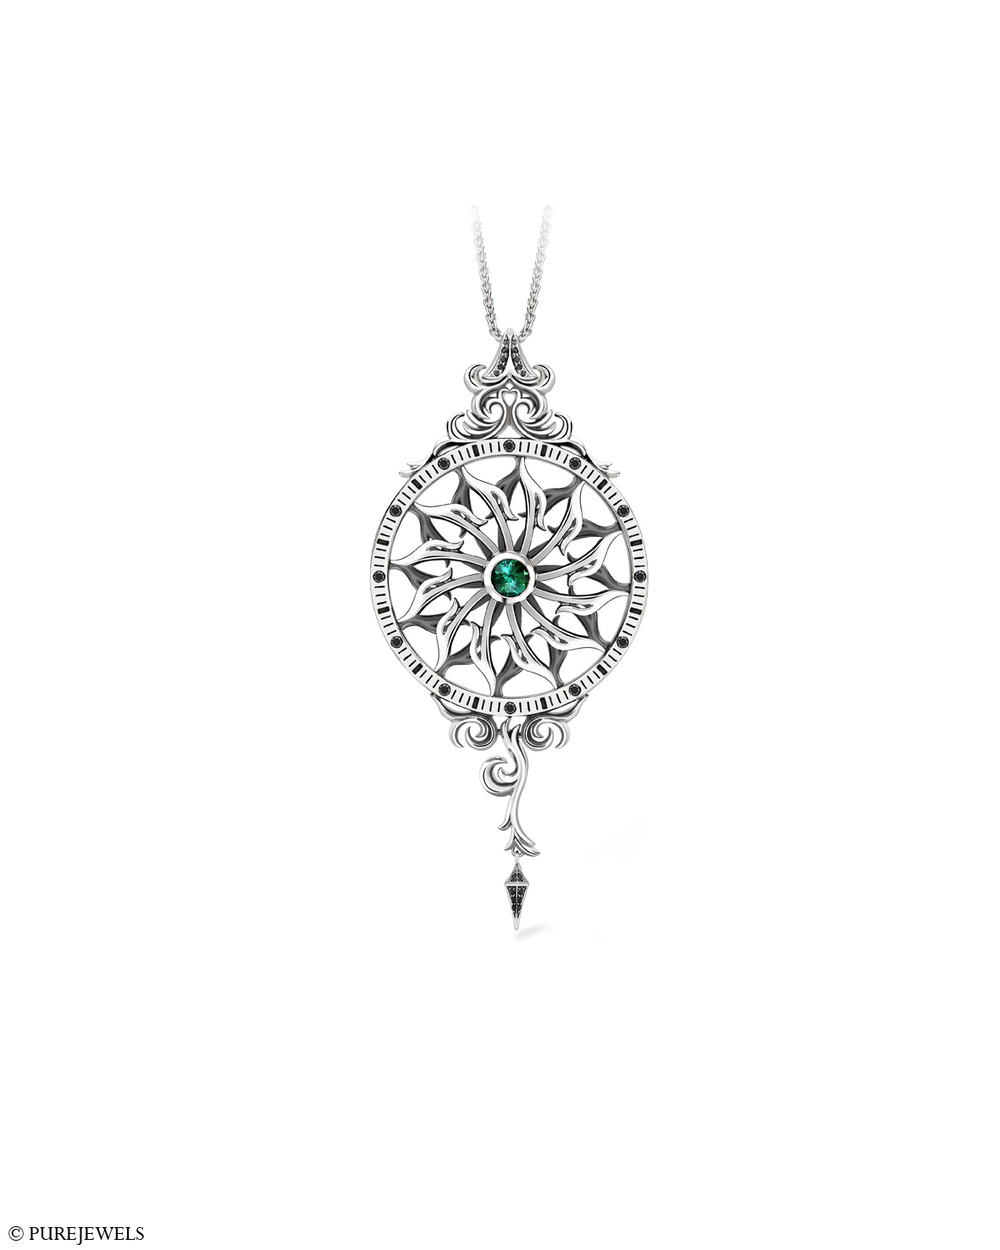 Lonmin Design Innovation Award 2011 Winning Spinning Pendant:  Platinum, black diamonds & tourmaline. Designed for  PureJewels .